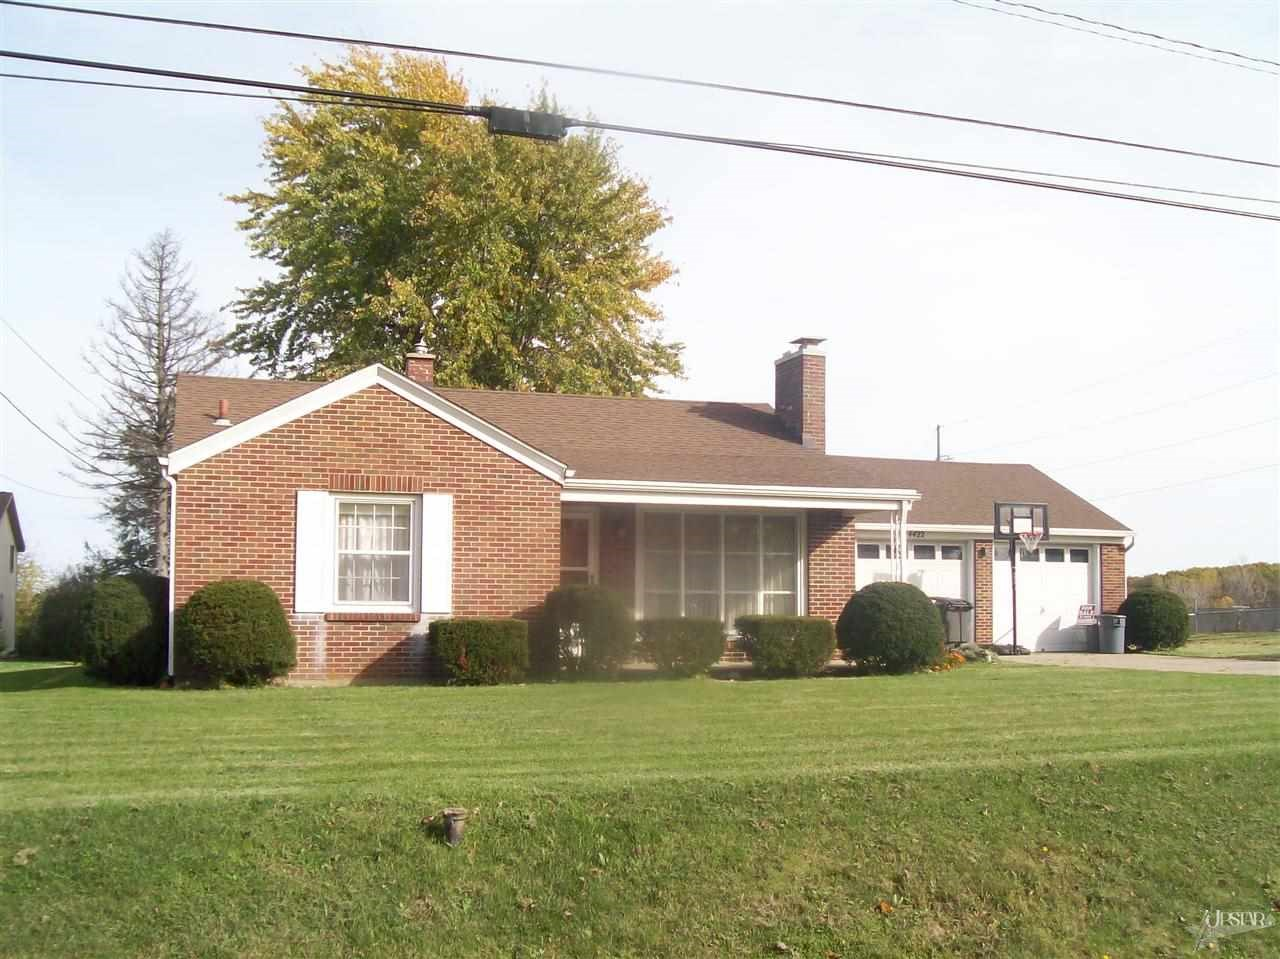 4422 Hillegas Road, Fort Wayne, IN 46818